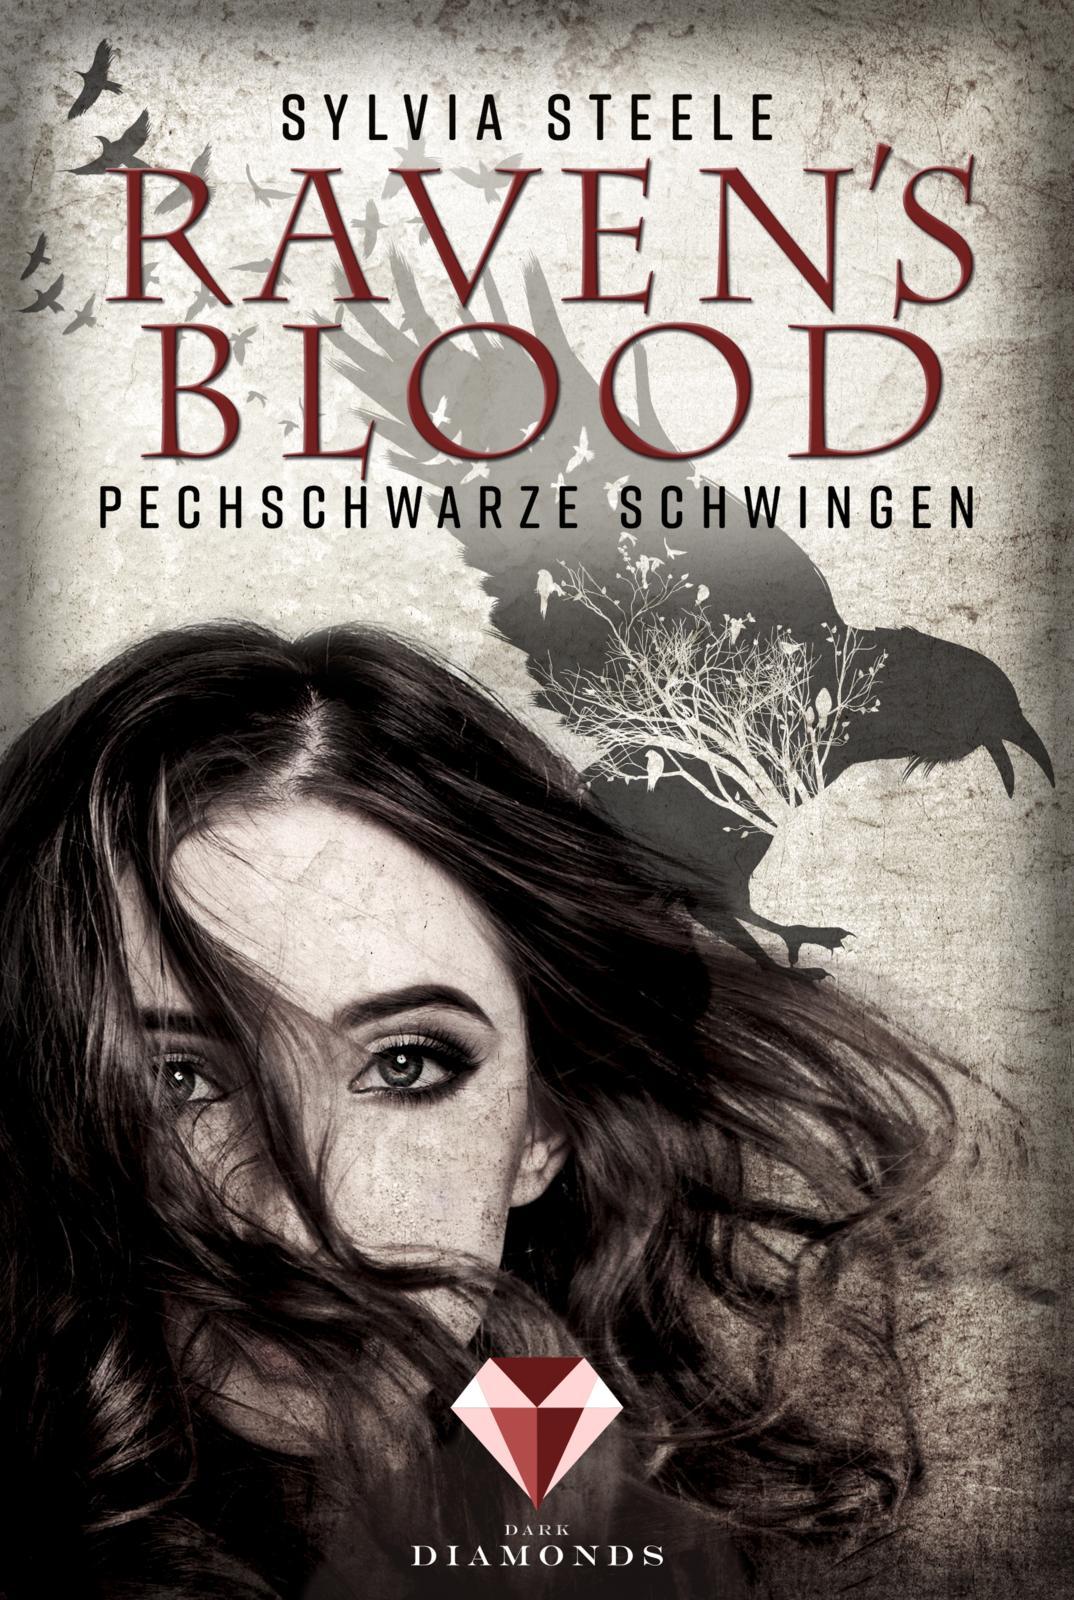 Steele, Sylvia: Raven's Blood - Pechschwarze Schwingen